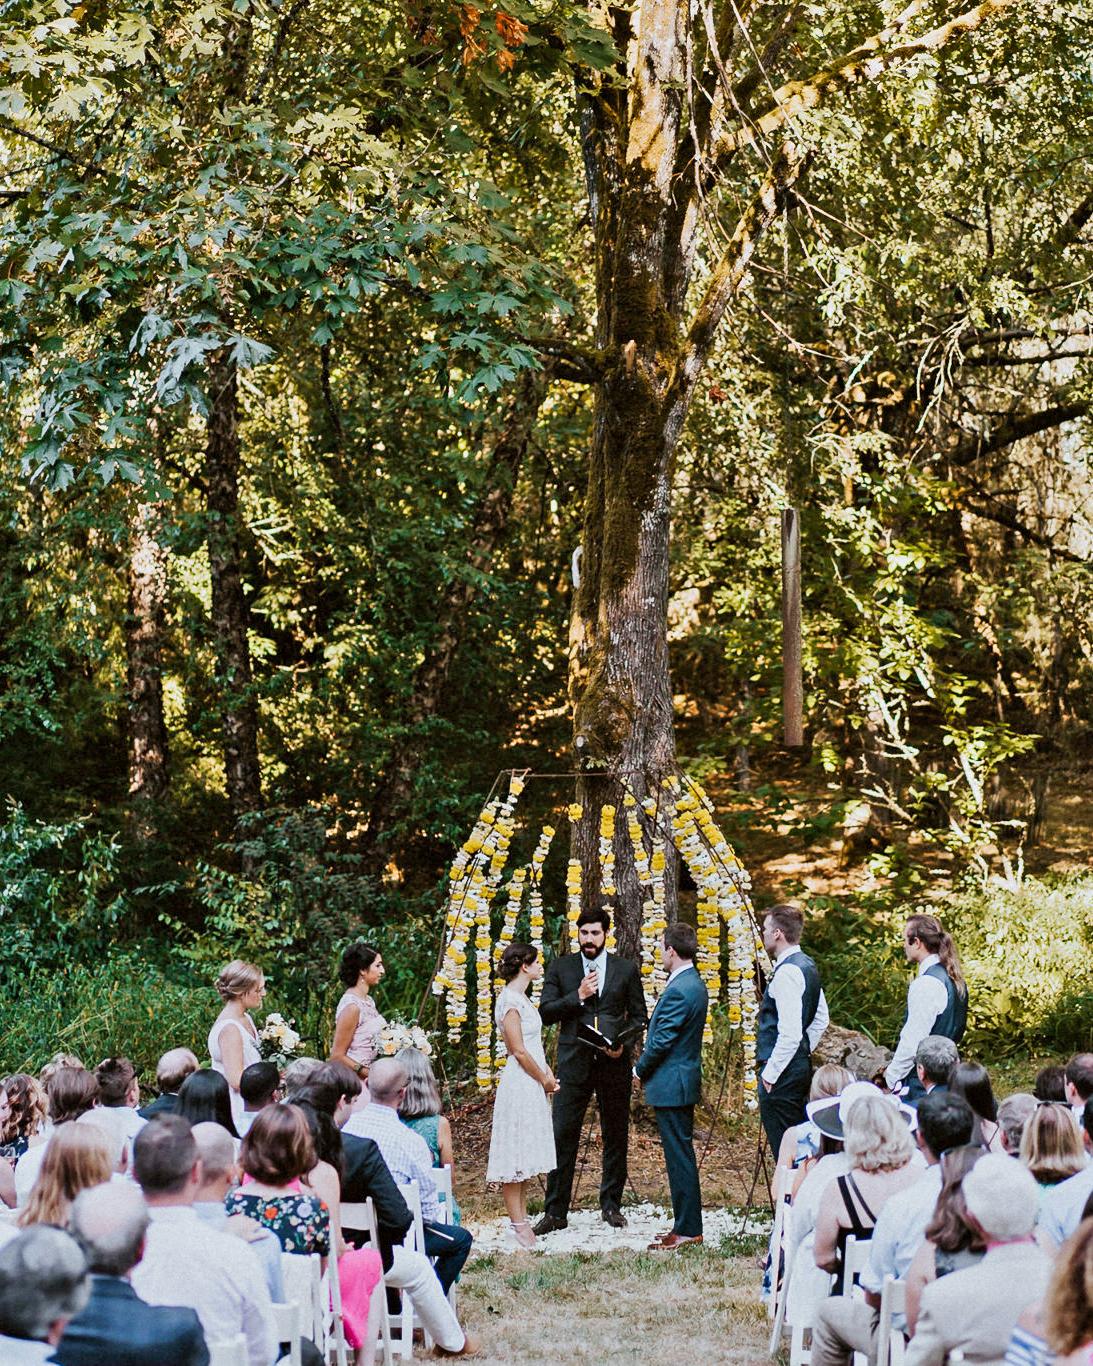 amy nick wedding ceremony tree